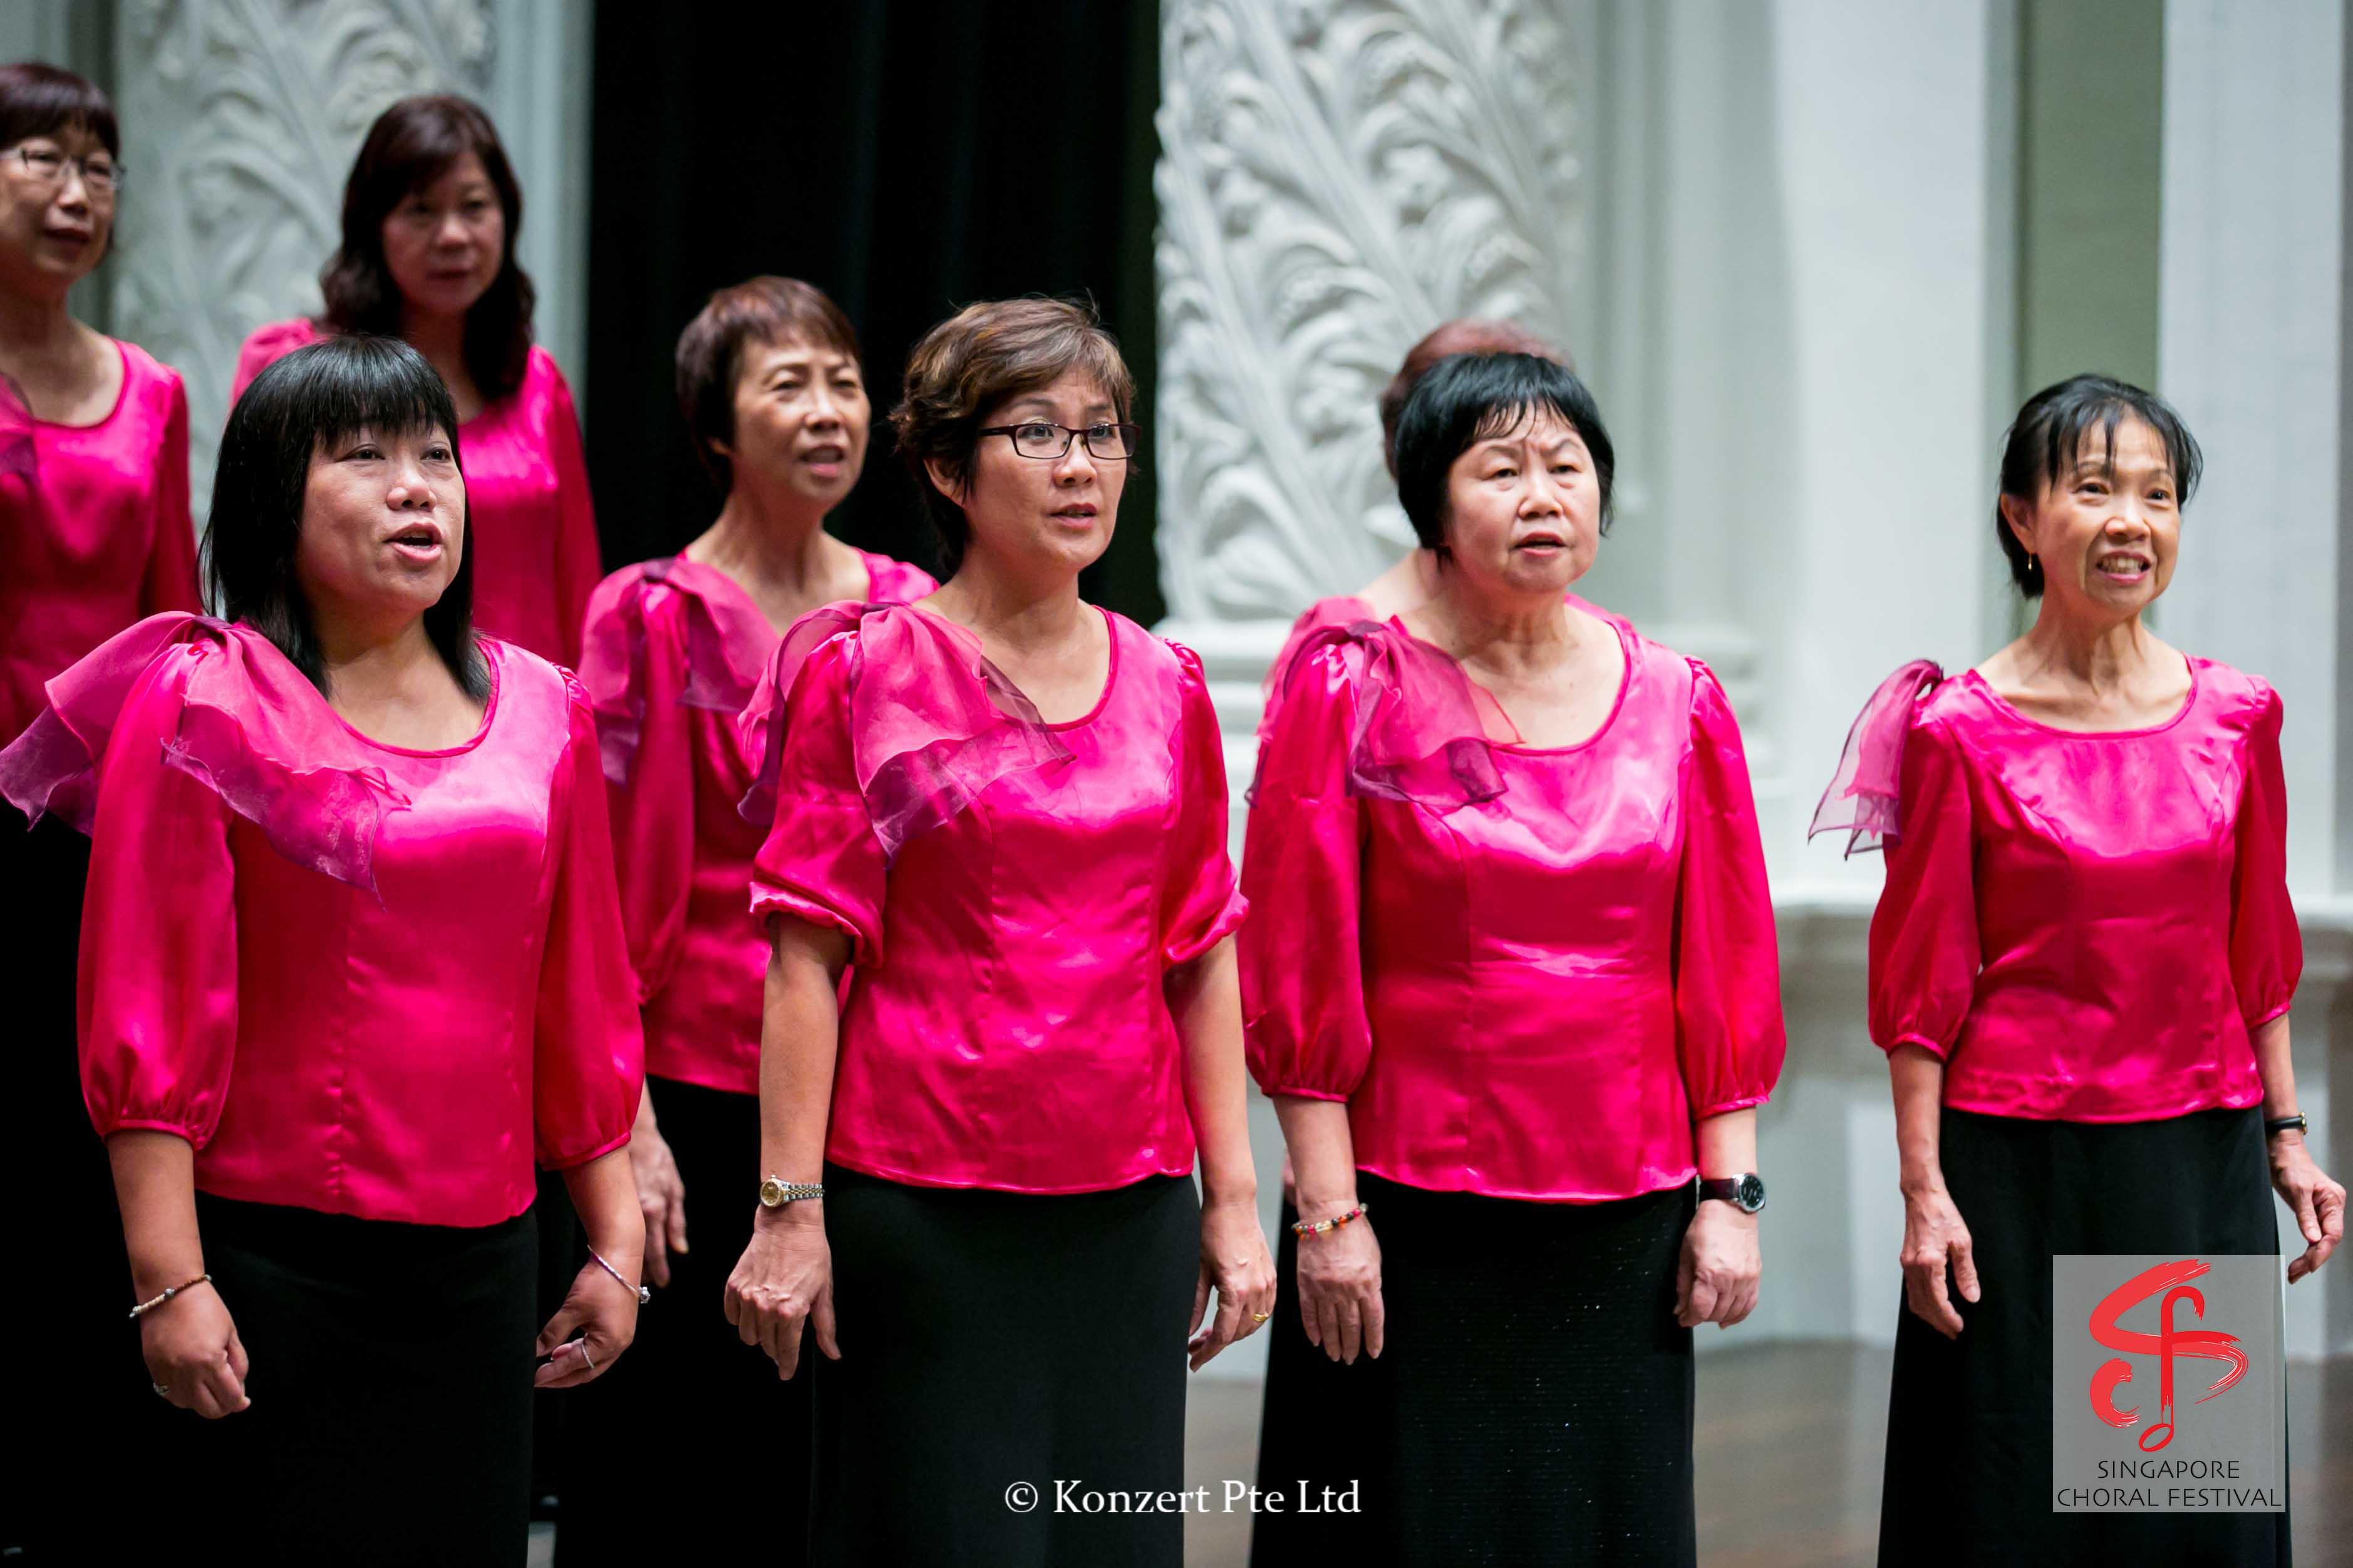 Singapore Choral Festival 7-8-15 (38).jpg